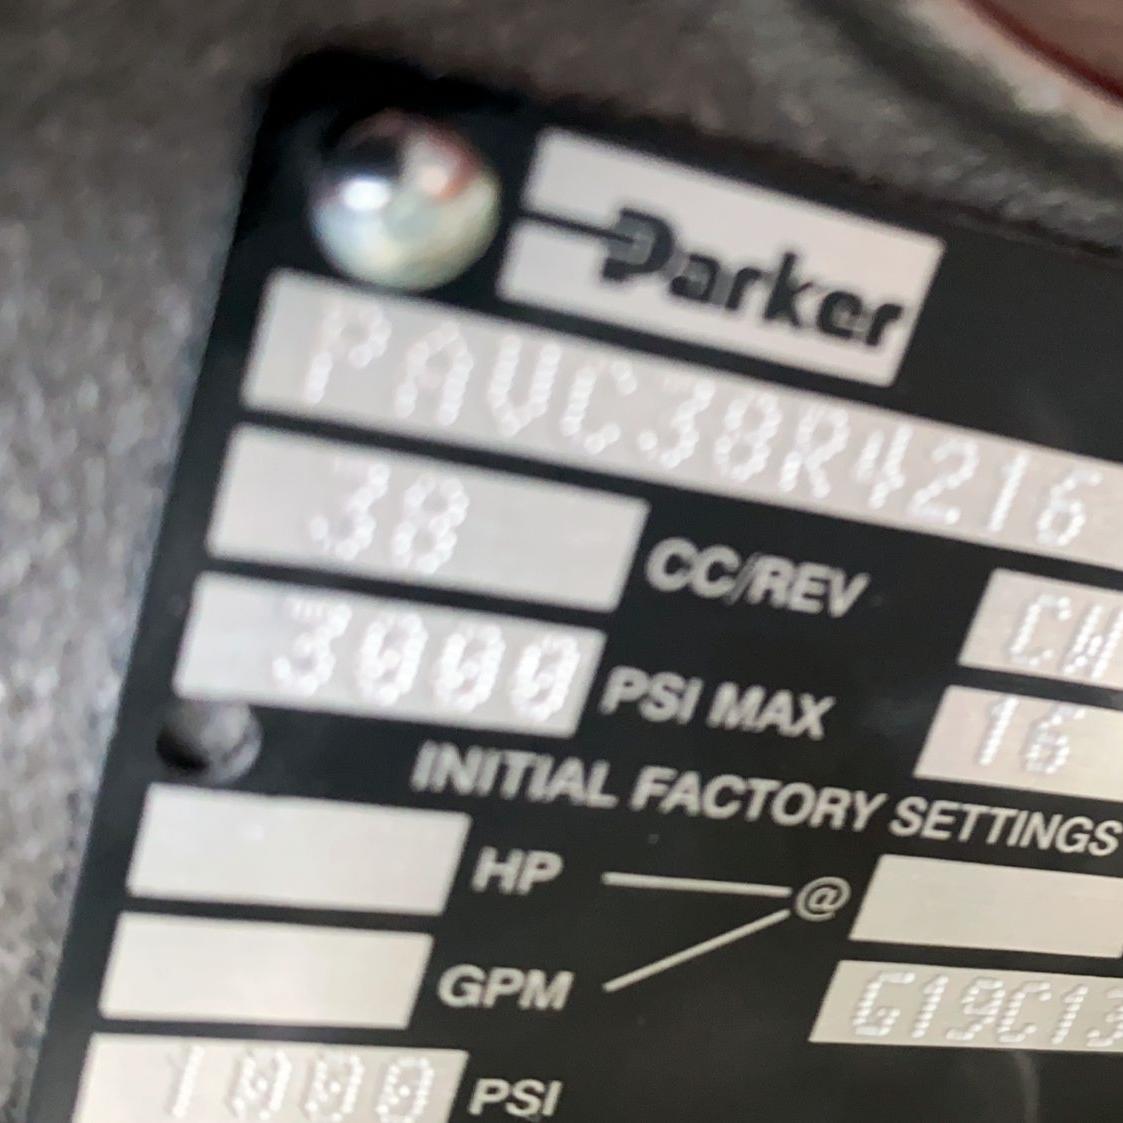 Parker派克节流阀TDA040EW09B2NXW21现货